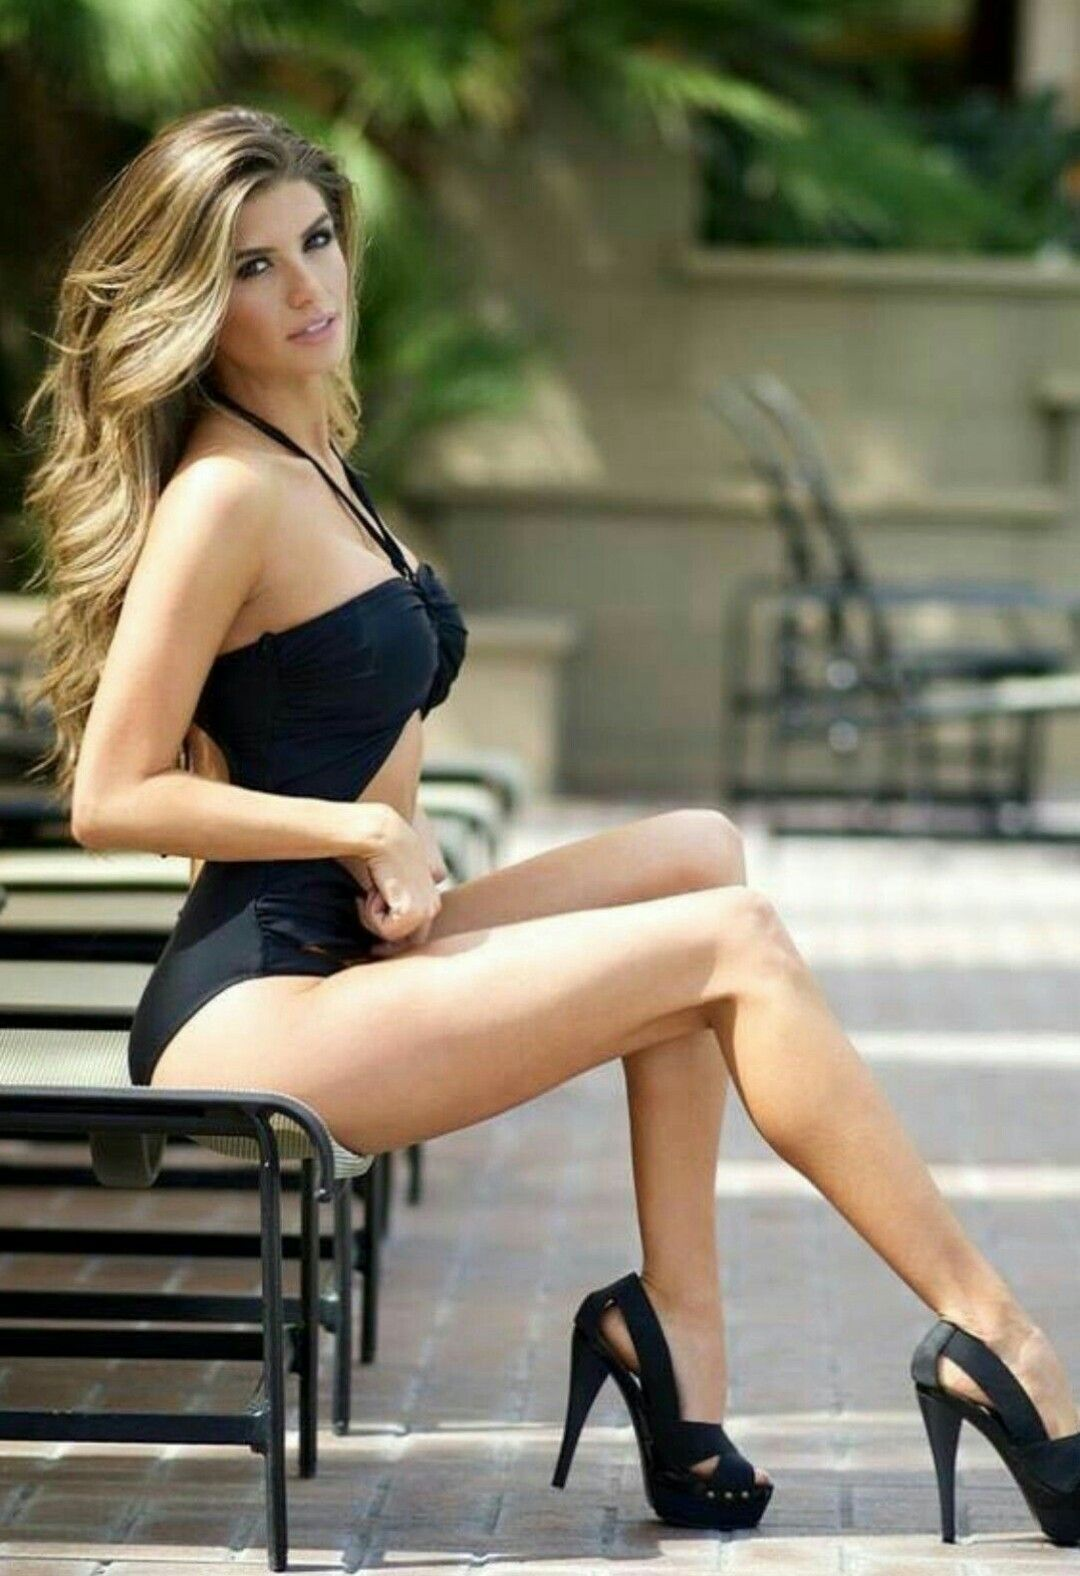 Nice Legs And Heels